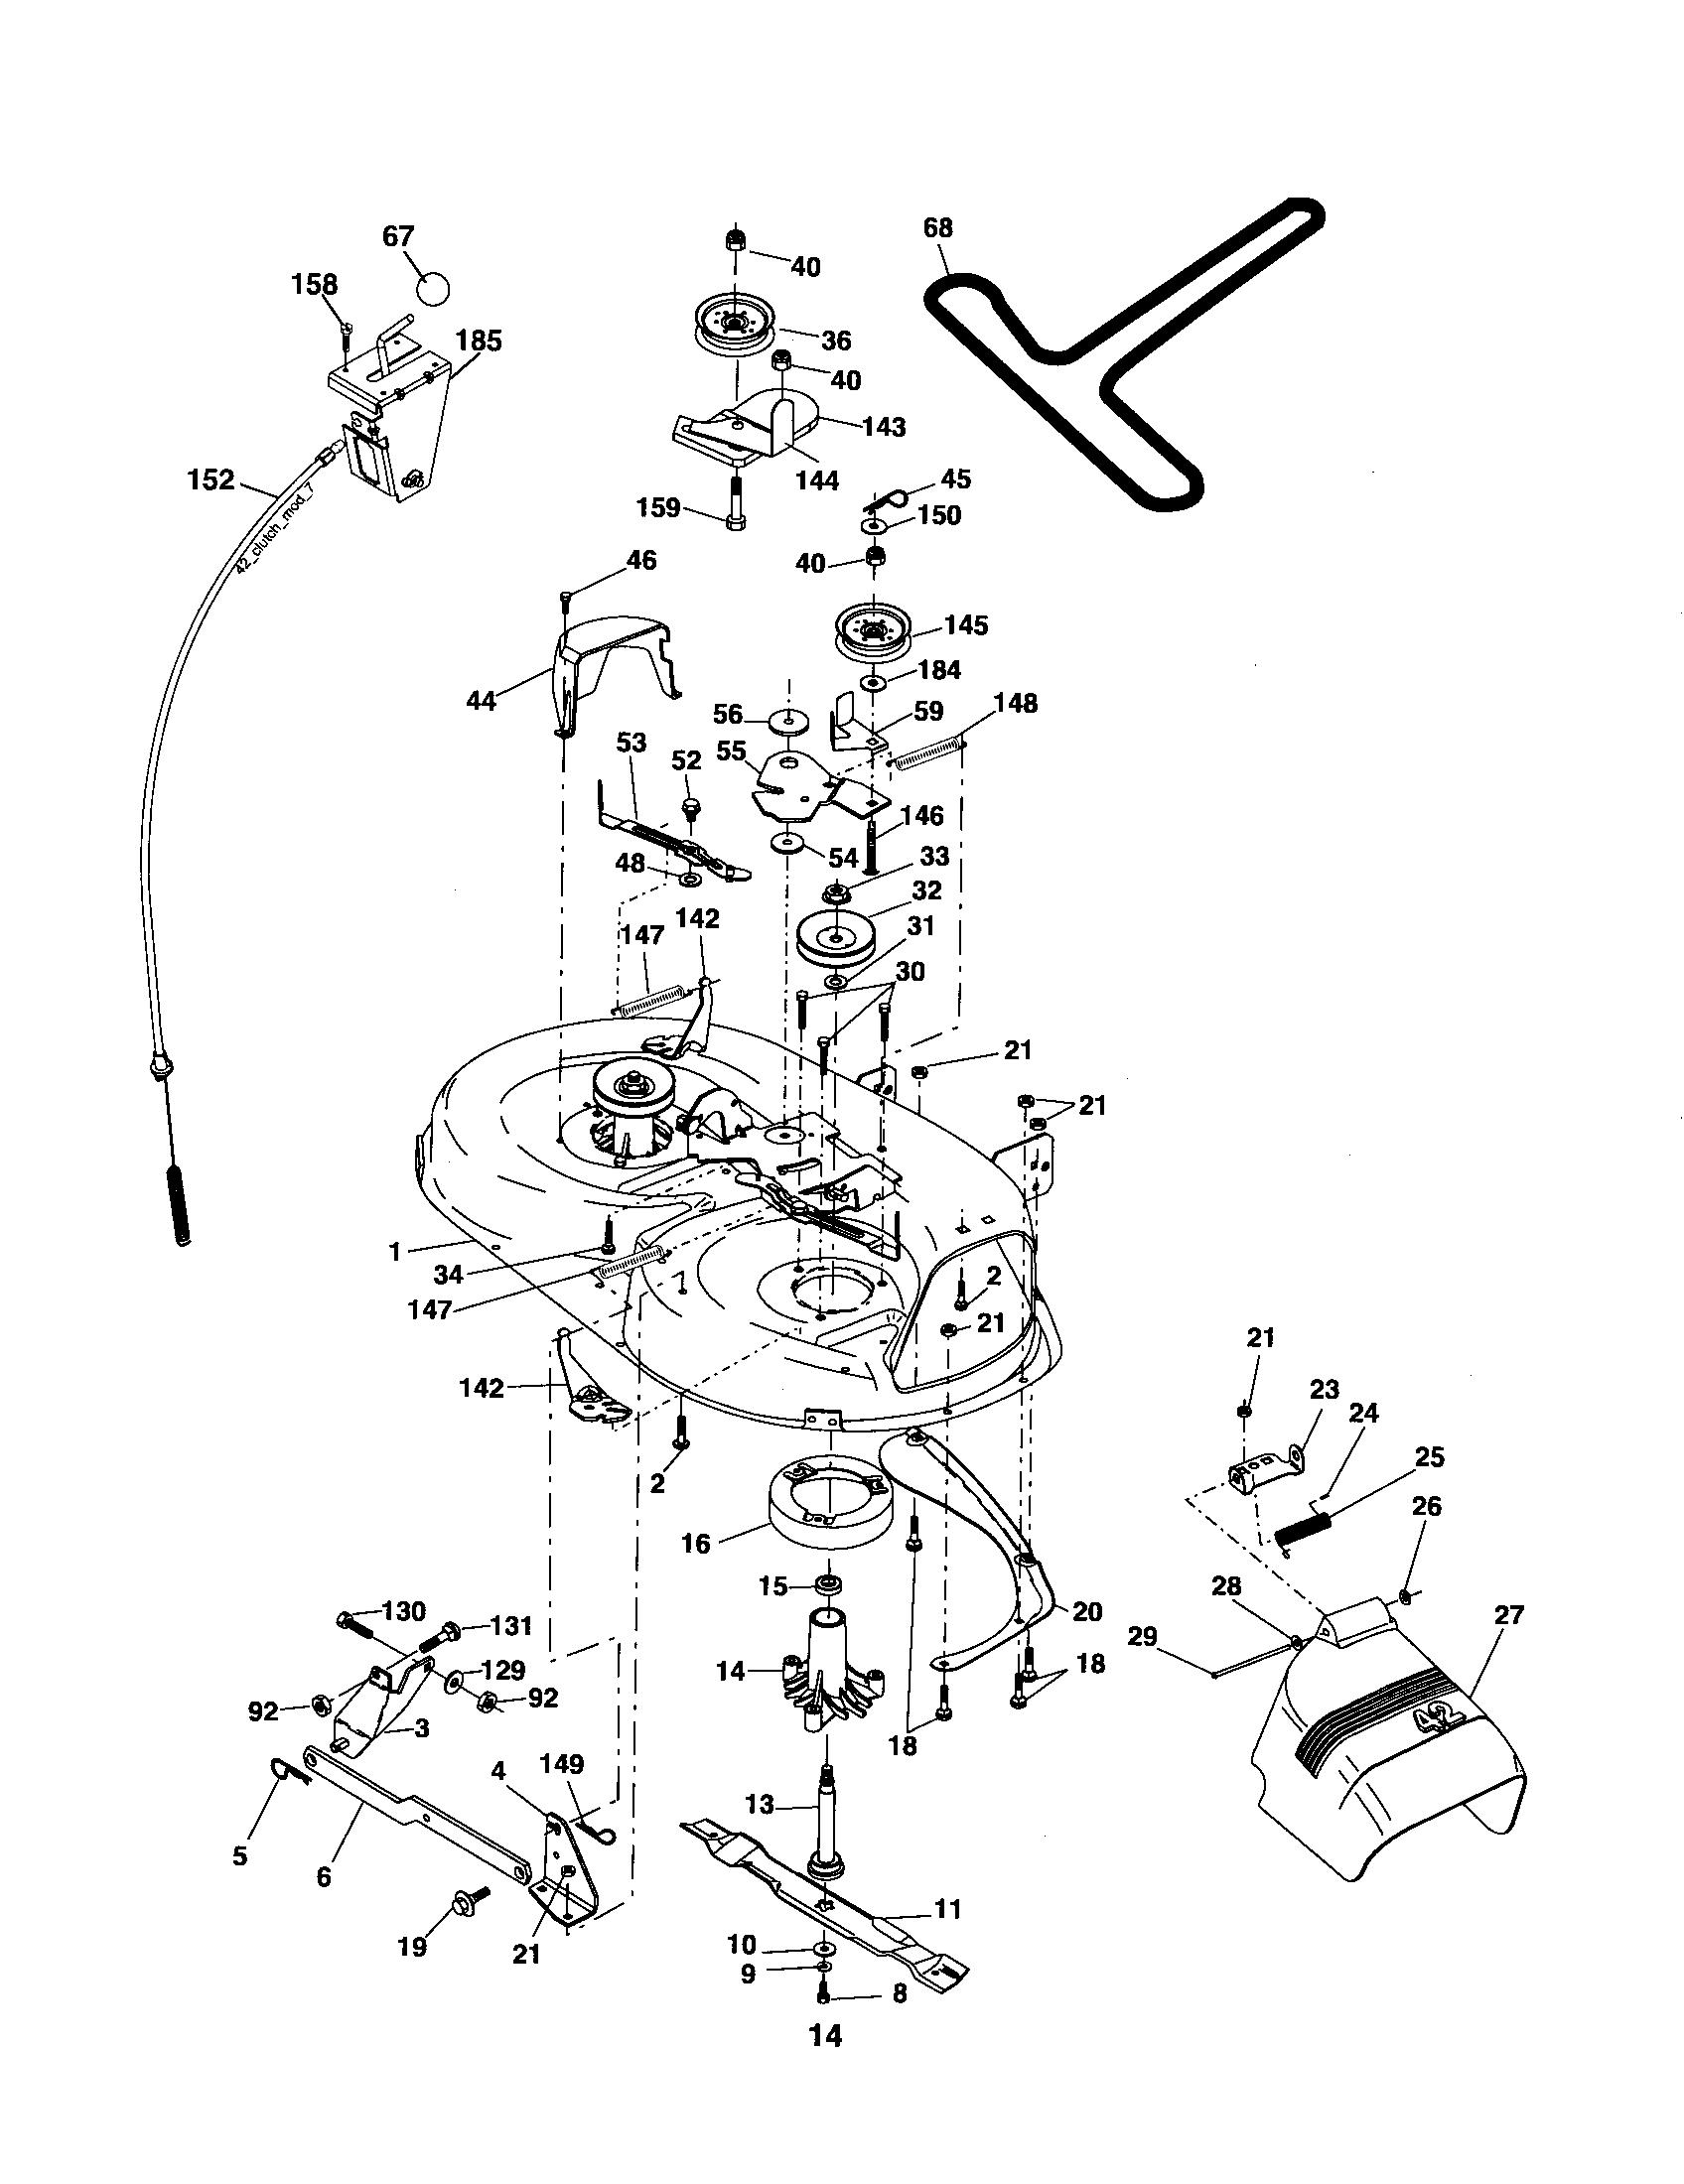 [QNCB_7524]  CS_6236] Poulan Lawn Tractor Wiring Diagram Free Diagram | Poulan Riding Mower Wiring Diagram |  | Exxlu Ivoro Rect Mohammedshrine Librar Wiring 101